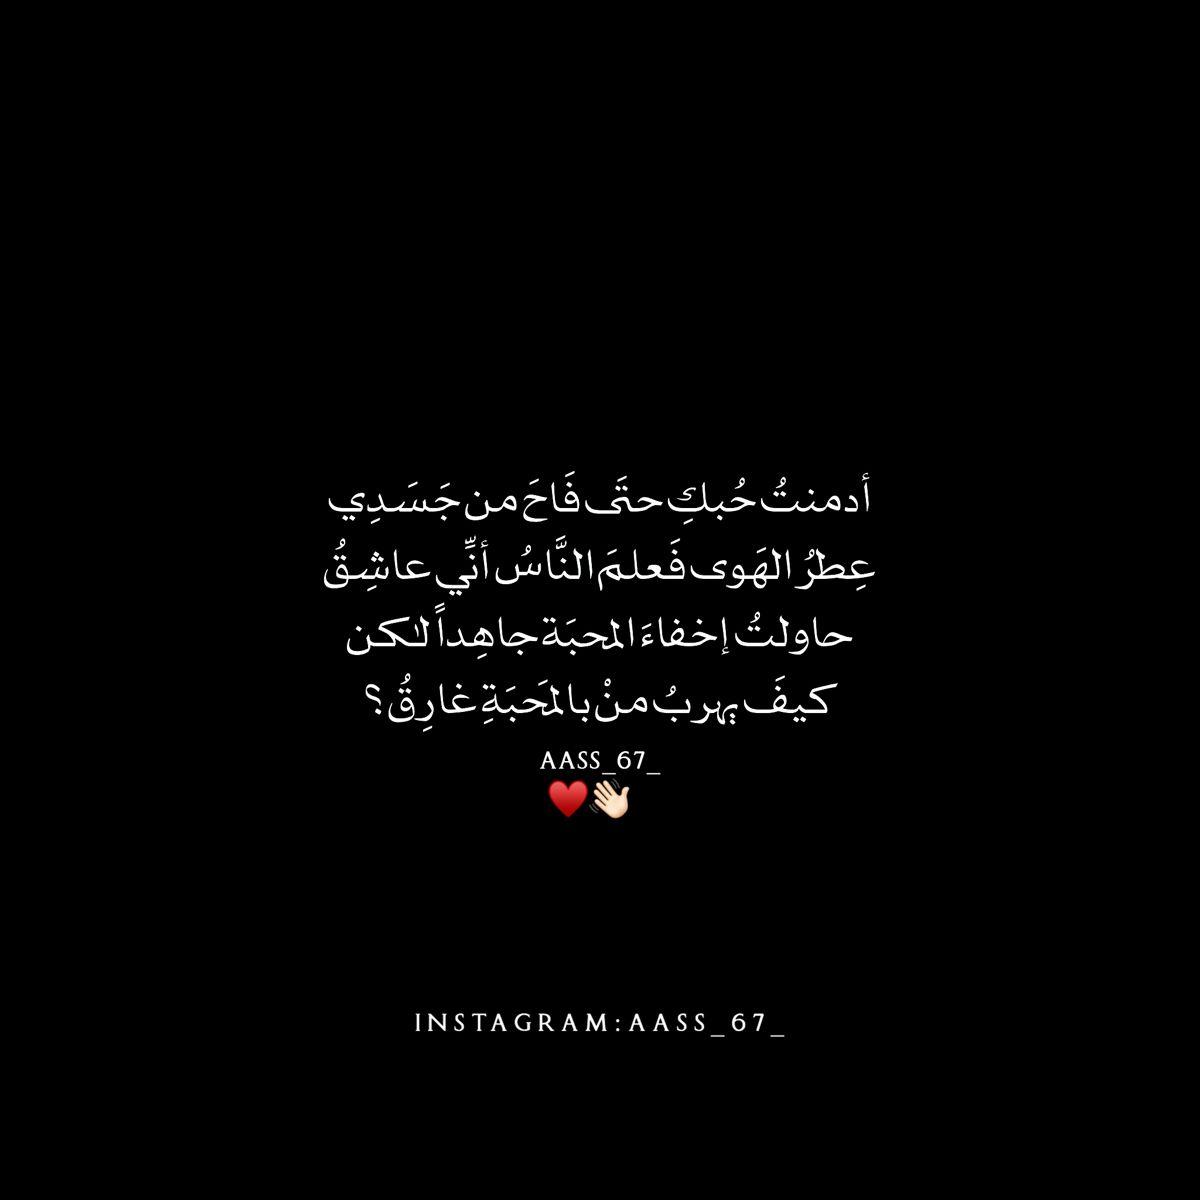 اقتباسات رمزيات كتاب كتابات تصاميم تصميم اغاني عرس حنيت حنين بغداد Islamic Love Quotes Love Quotes Quotes